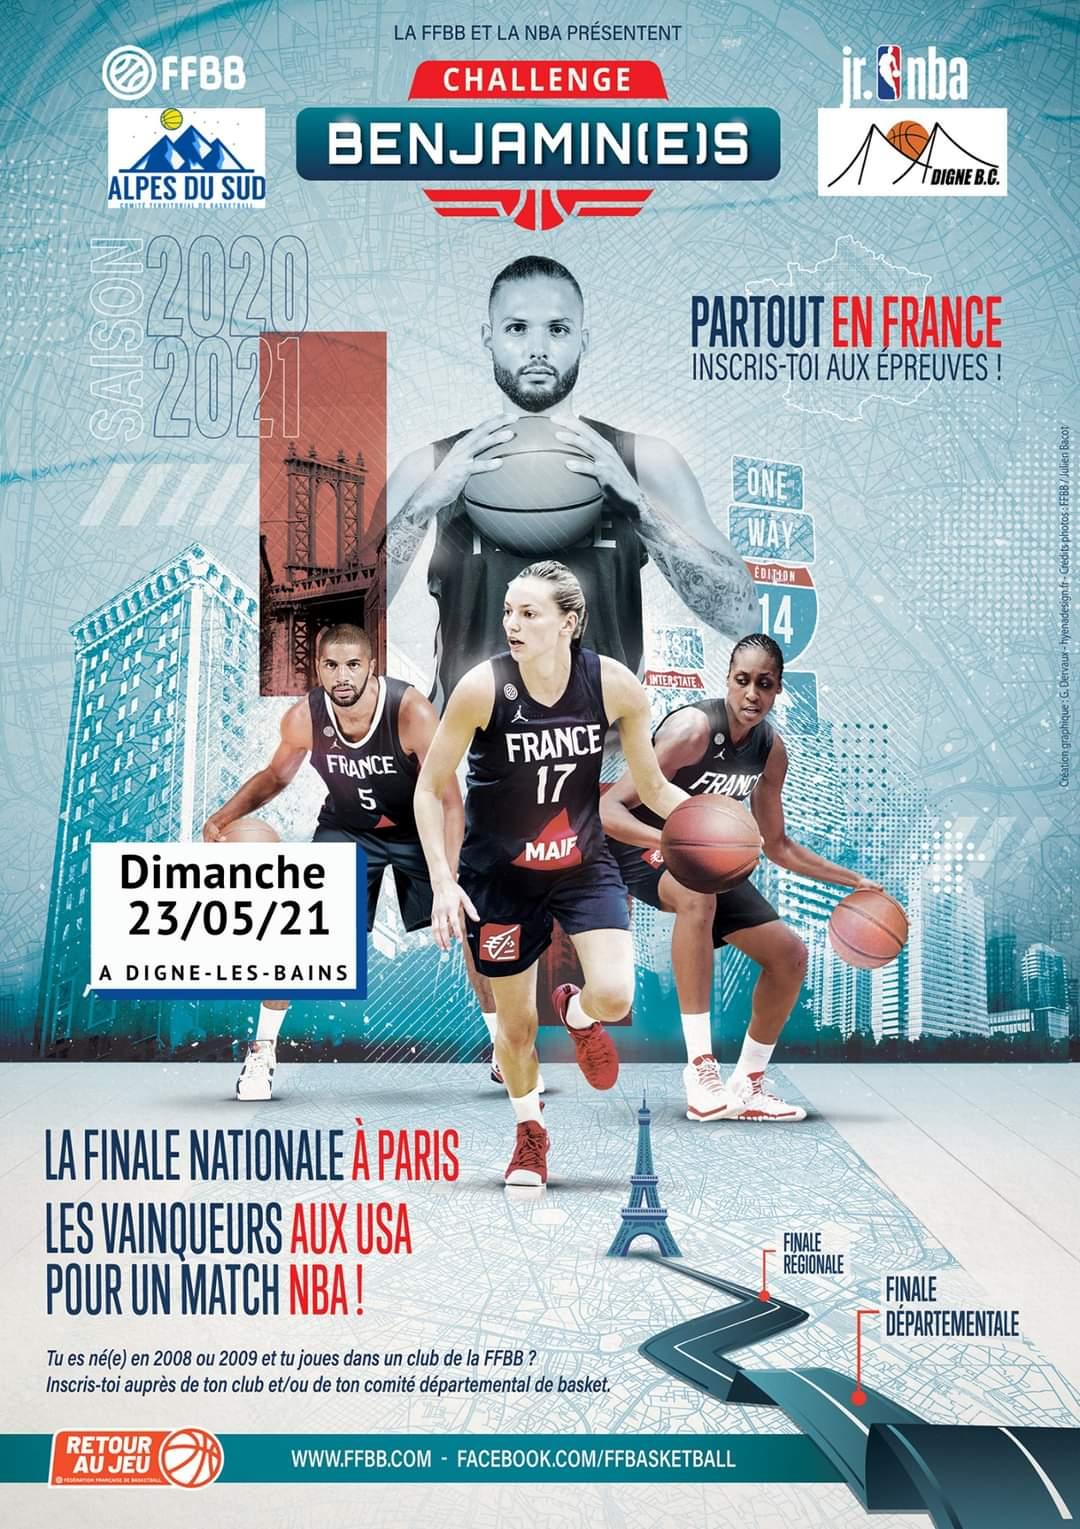 Challenge Benjamin(e)s 2021 : Finale départementale